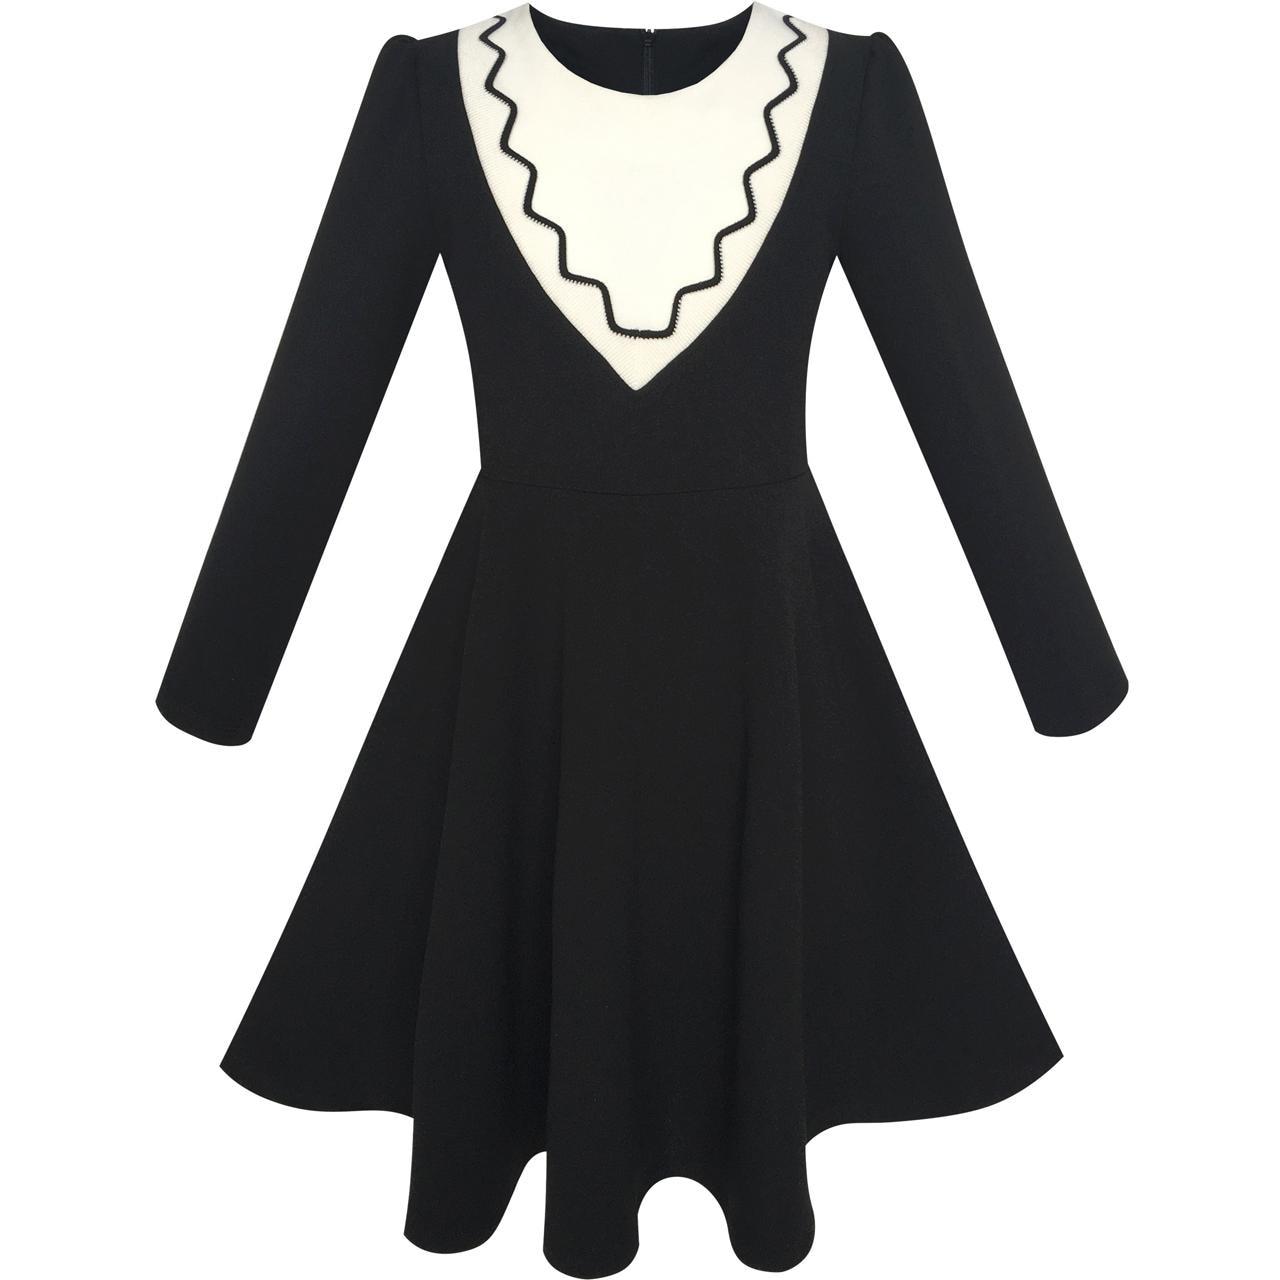 Black dress long sleeve uniform